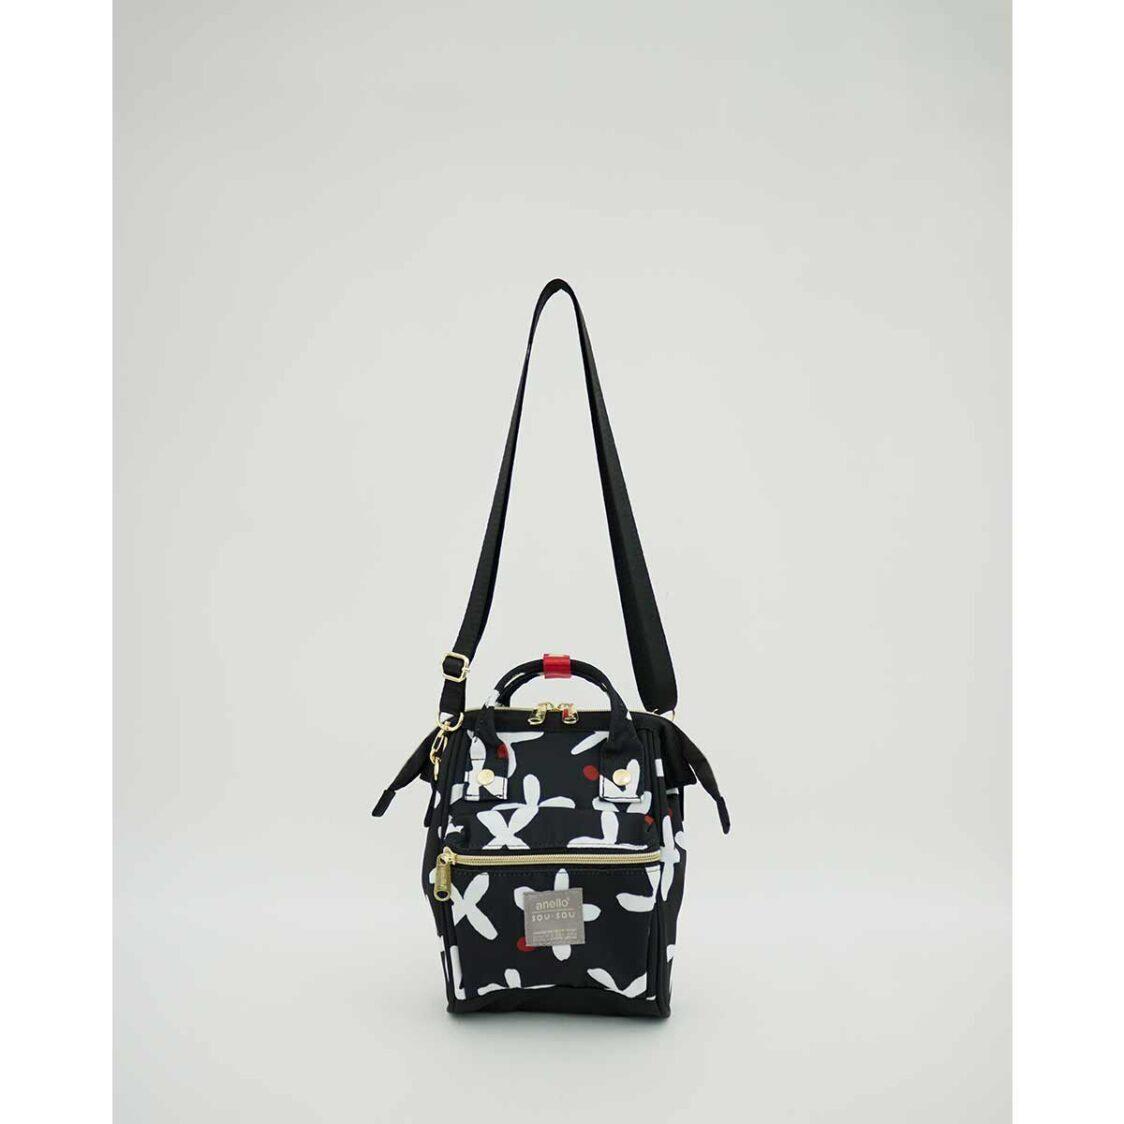 Anello X SousouT 2Way Micro Shoulder Bag Black